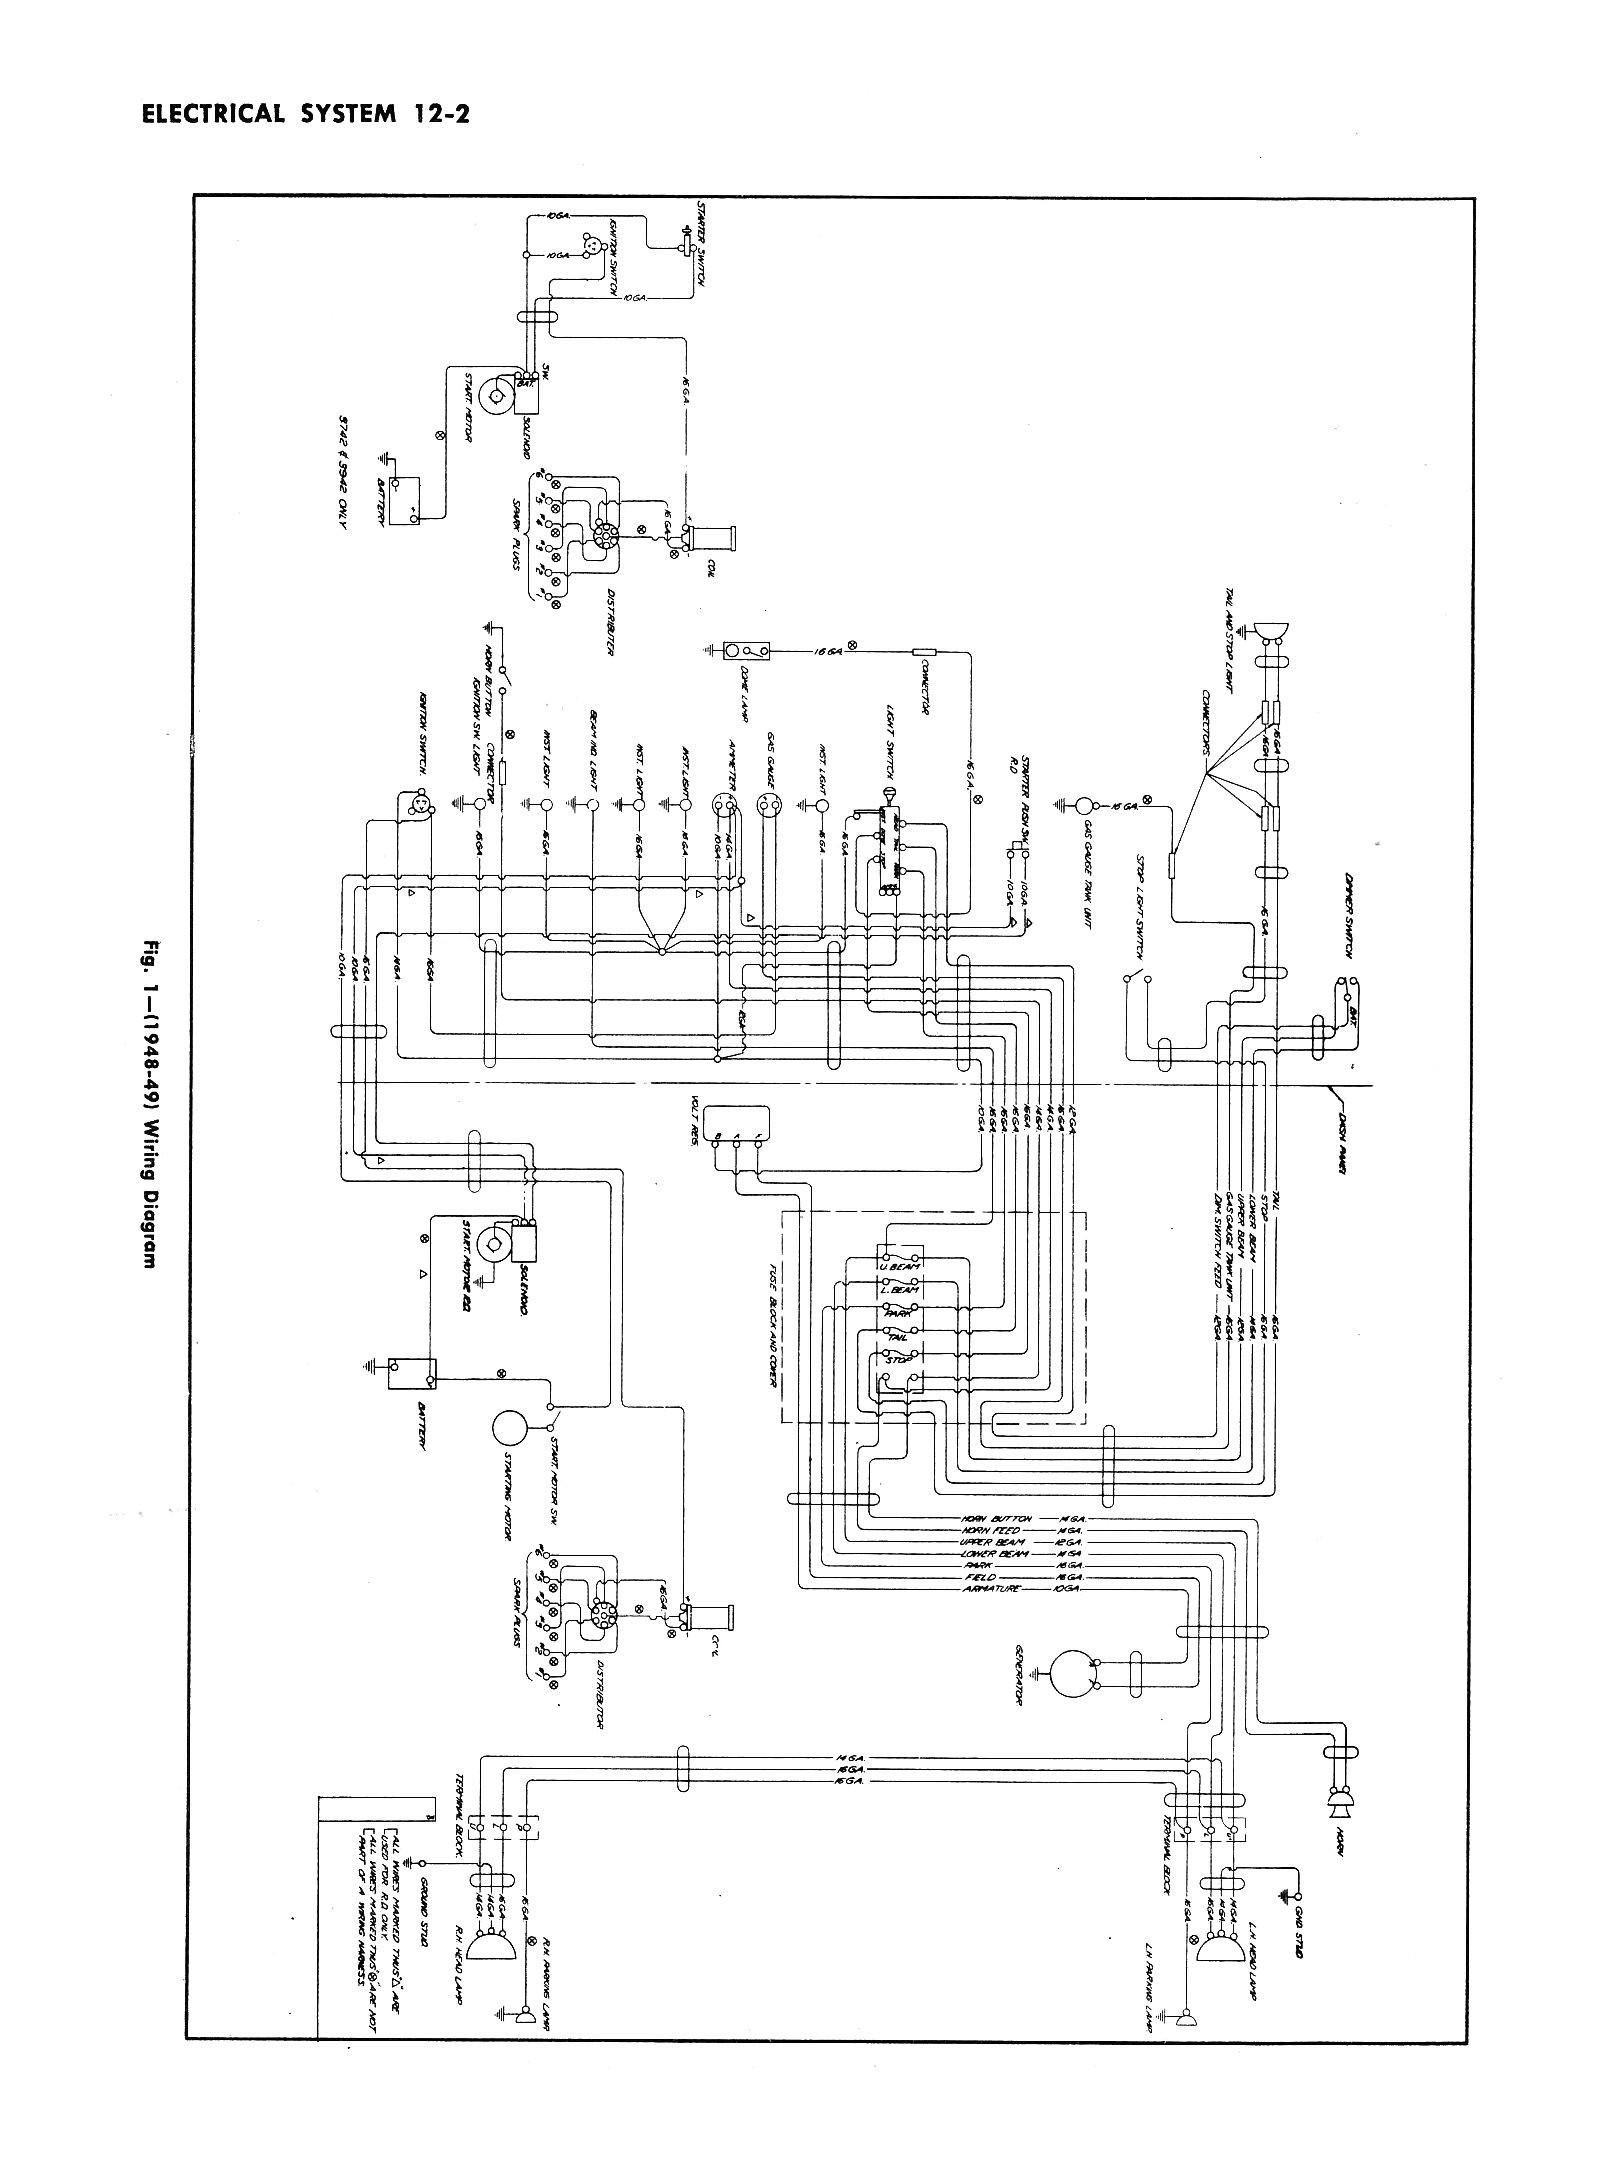 2006 scion xa headlight wiring diagram bmw m6 wiring